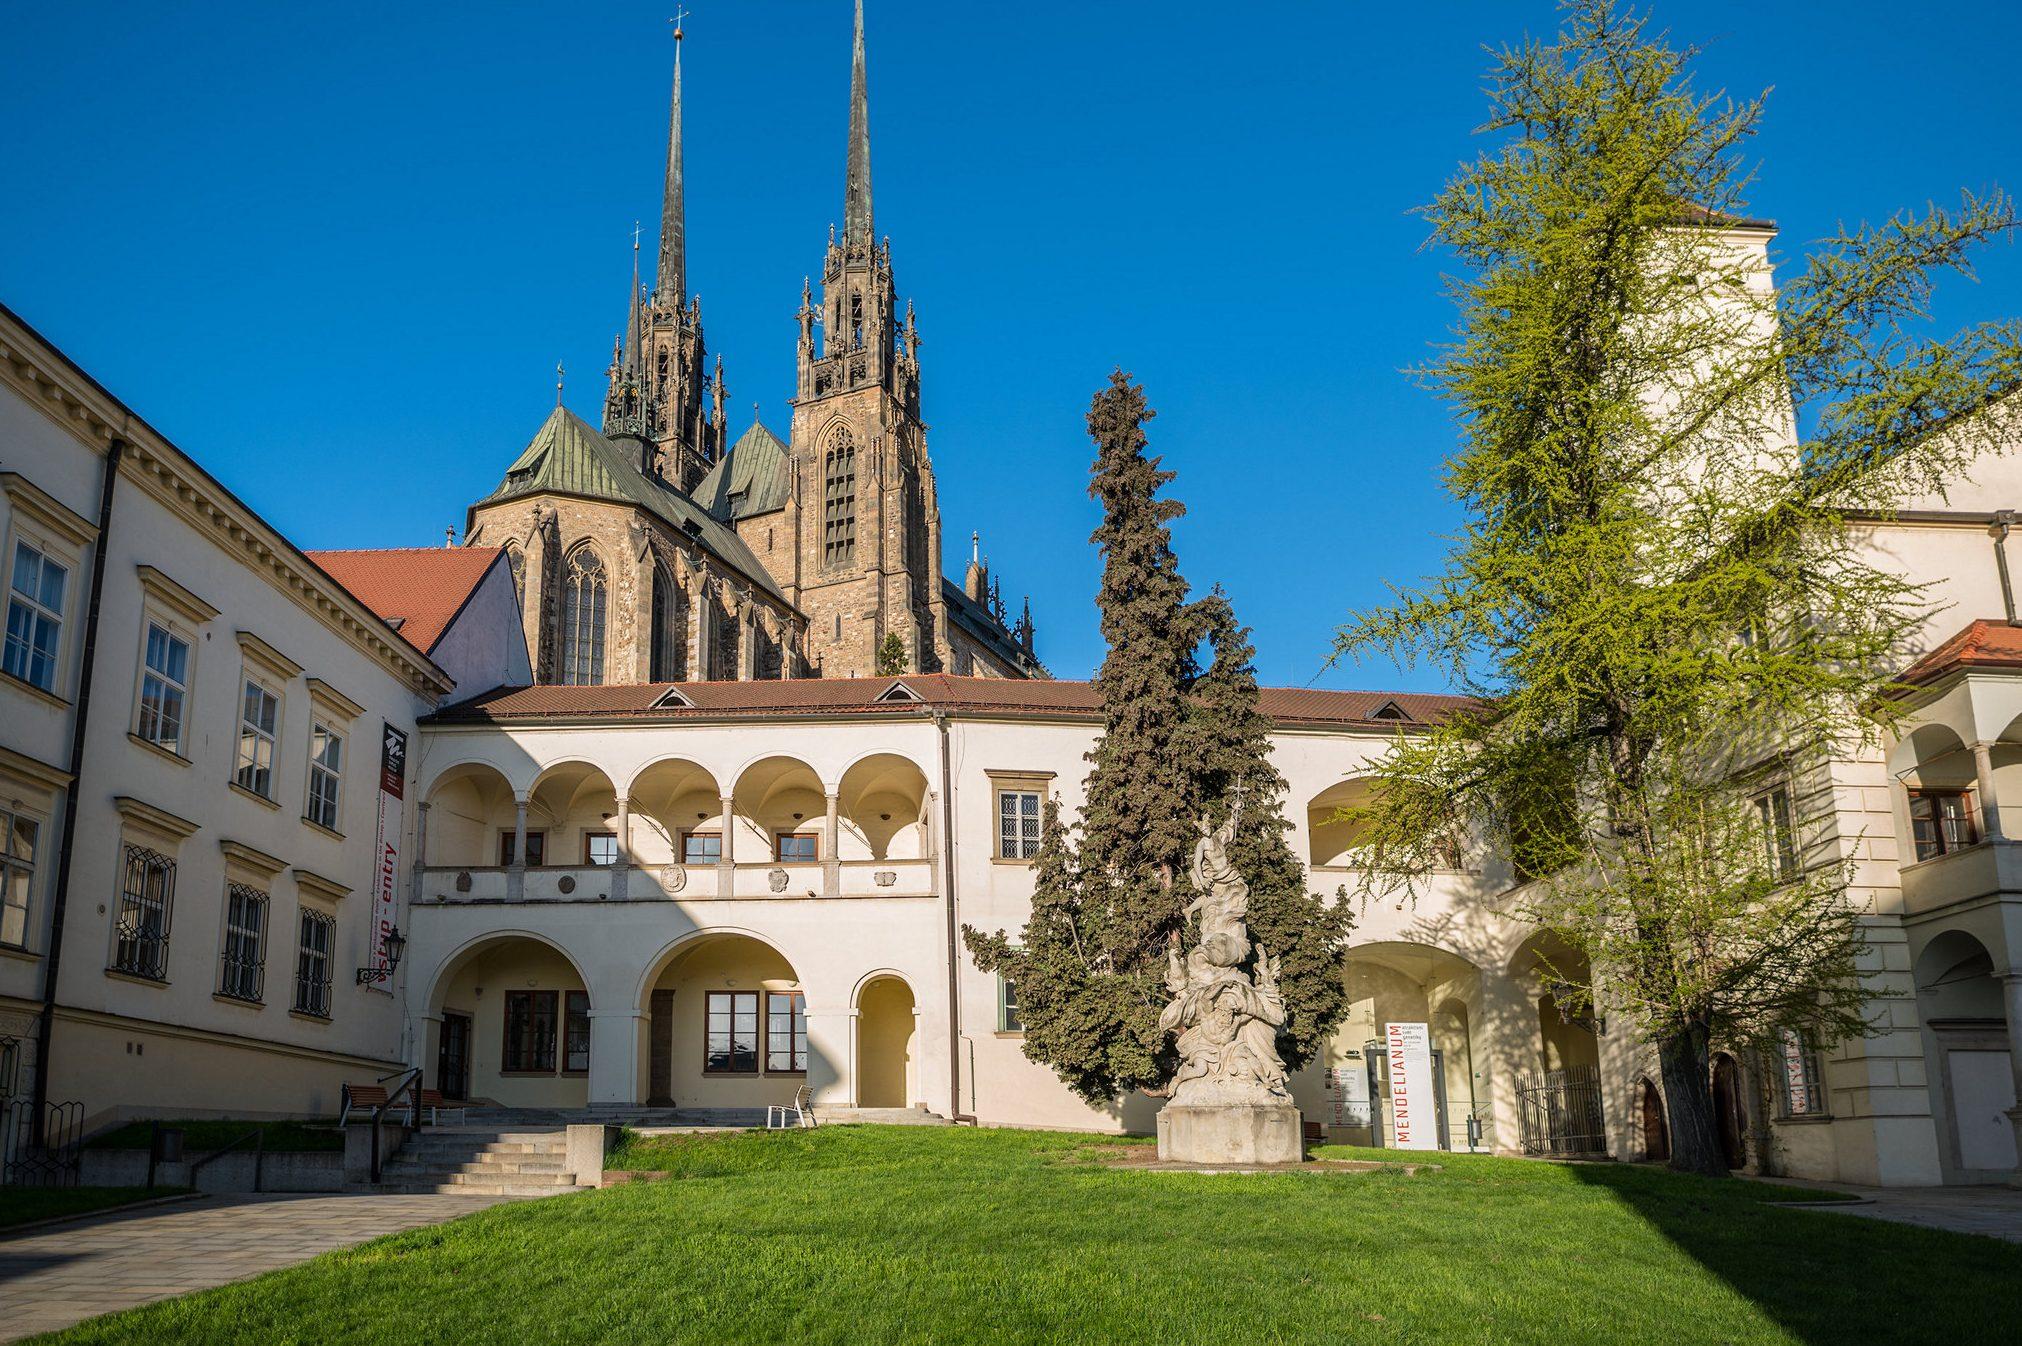 Biskupský dvůr (Bishop's Courtyard) in Brno